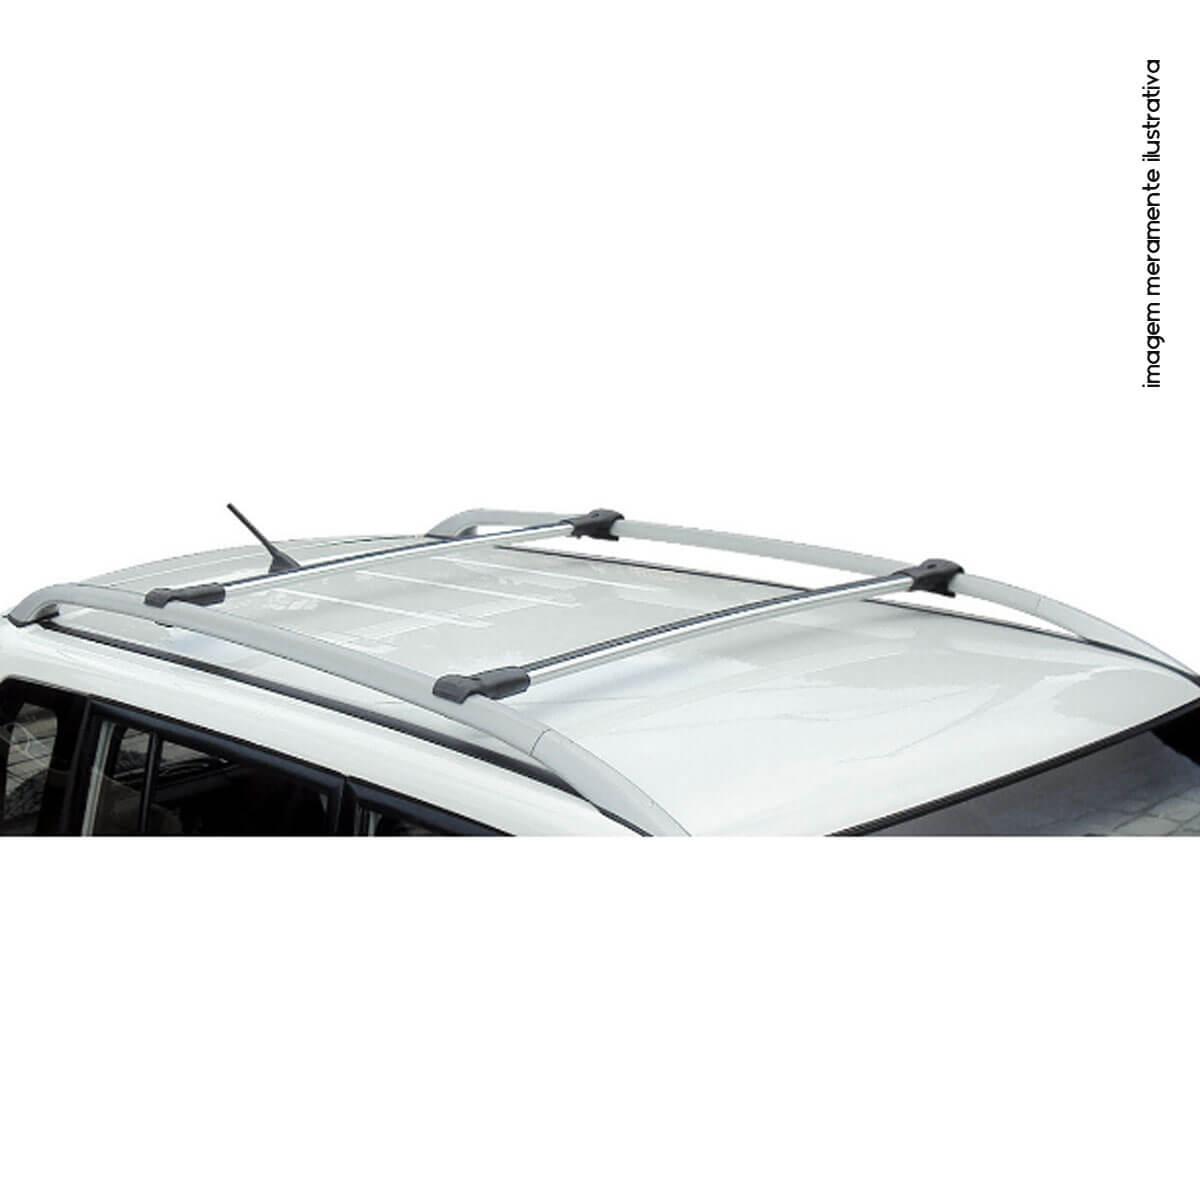 Travessa rack de teto larga alumínio Nova S10 cabine dupla 2012 a 2020